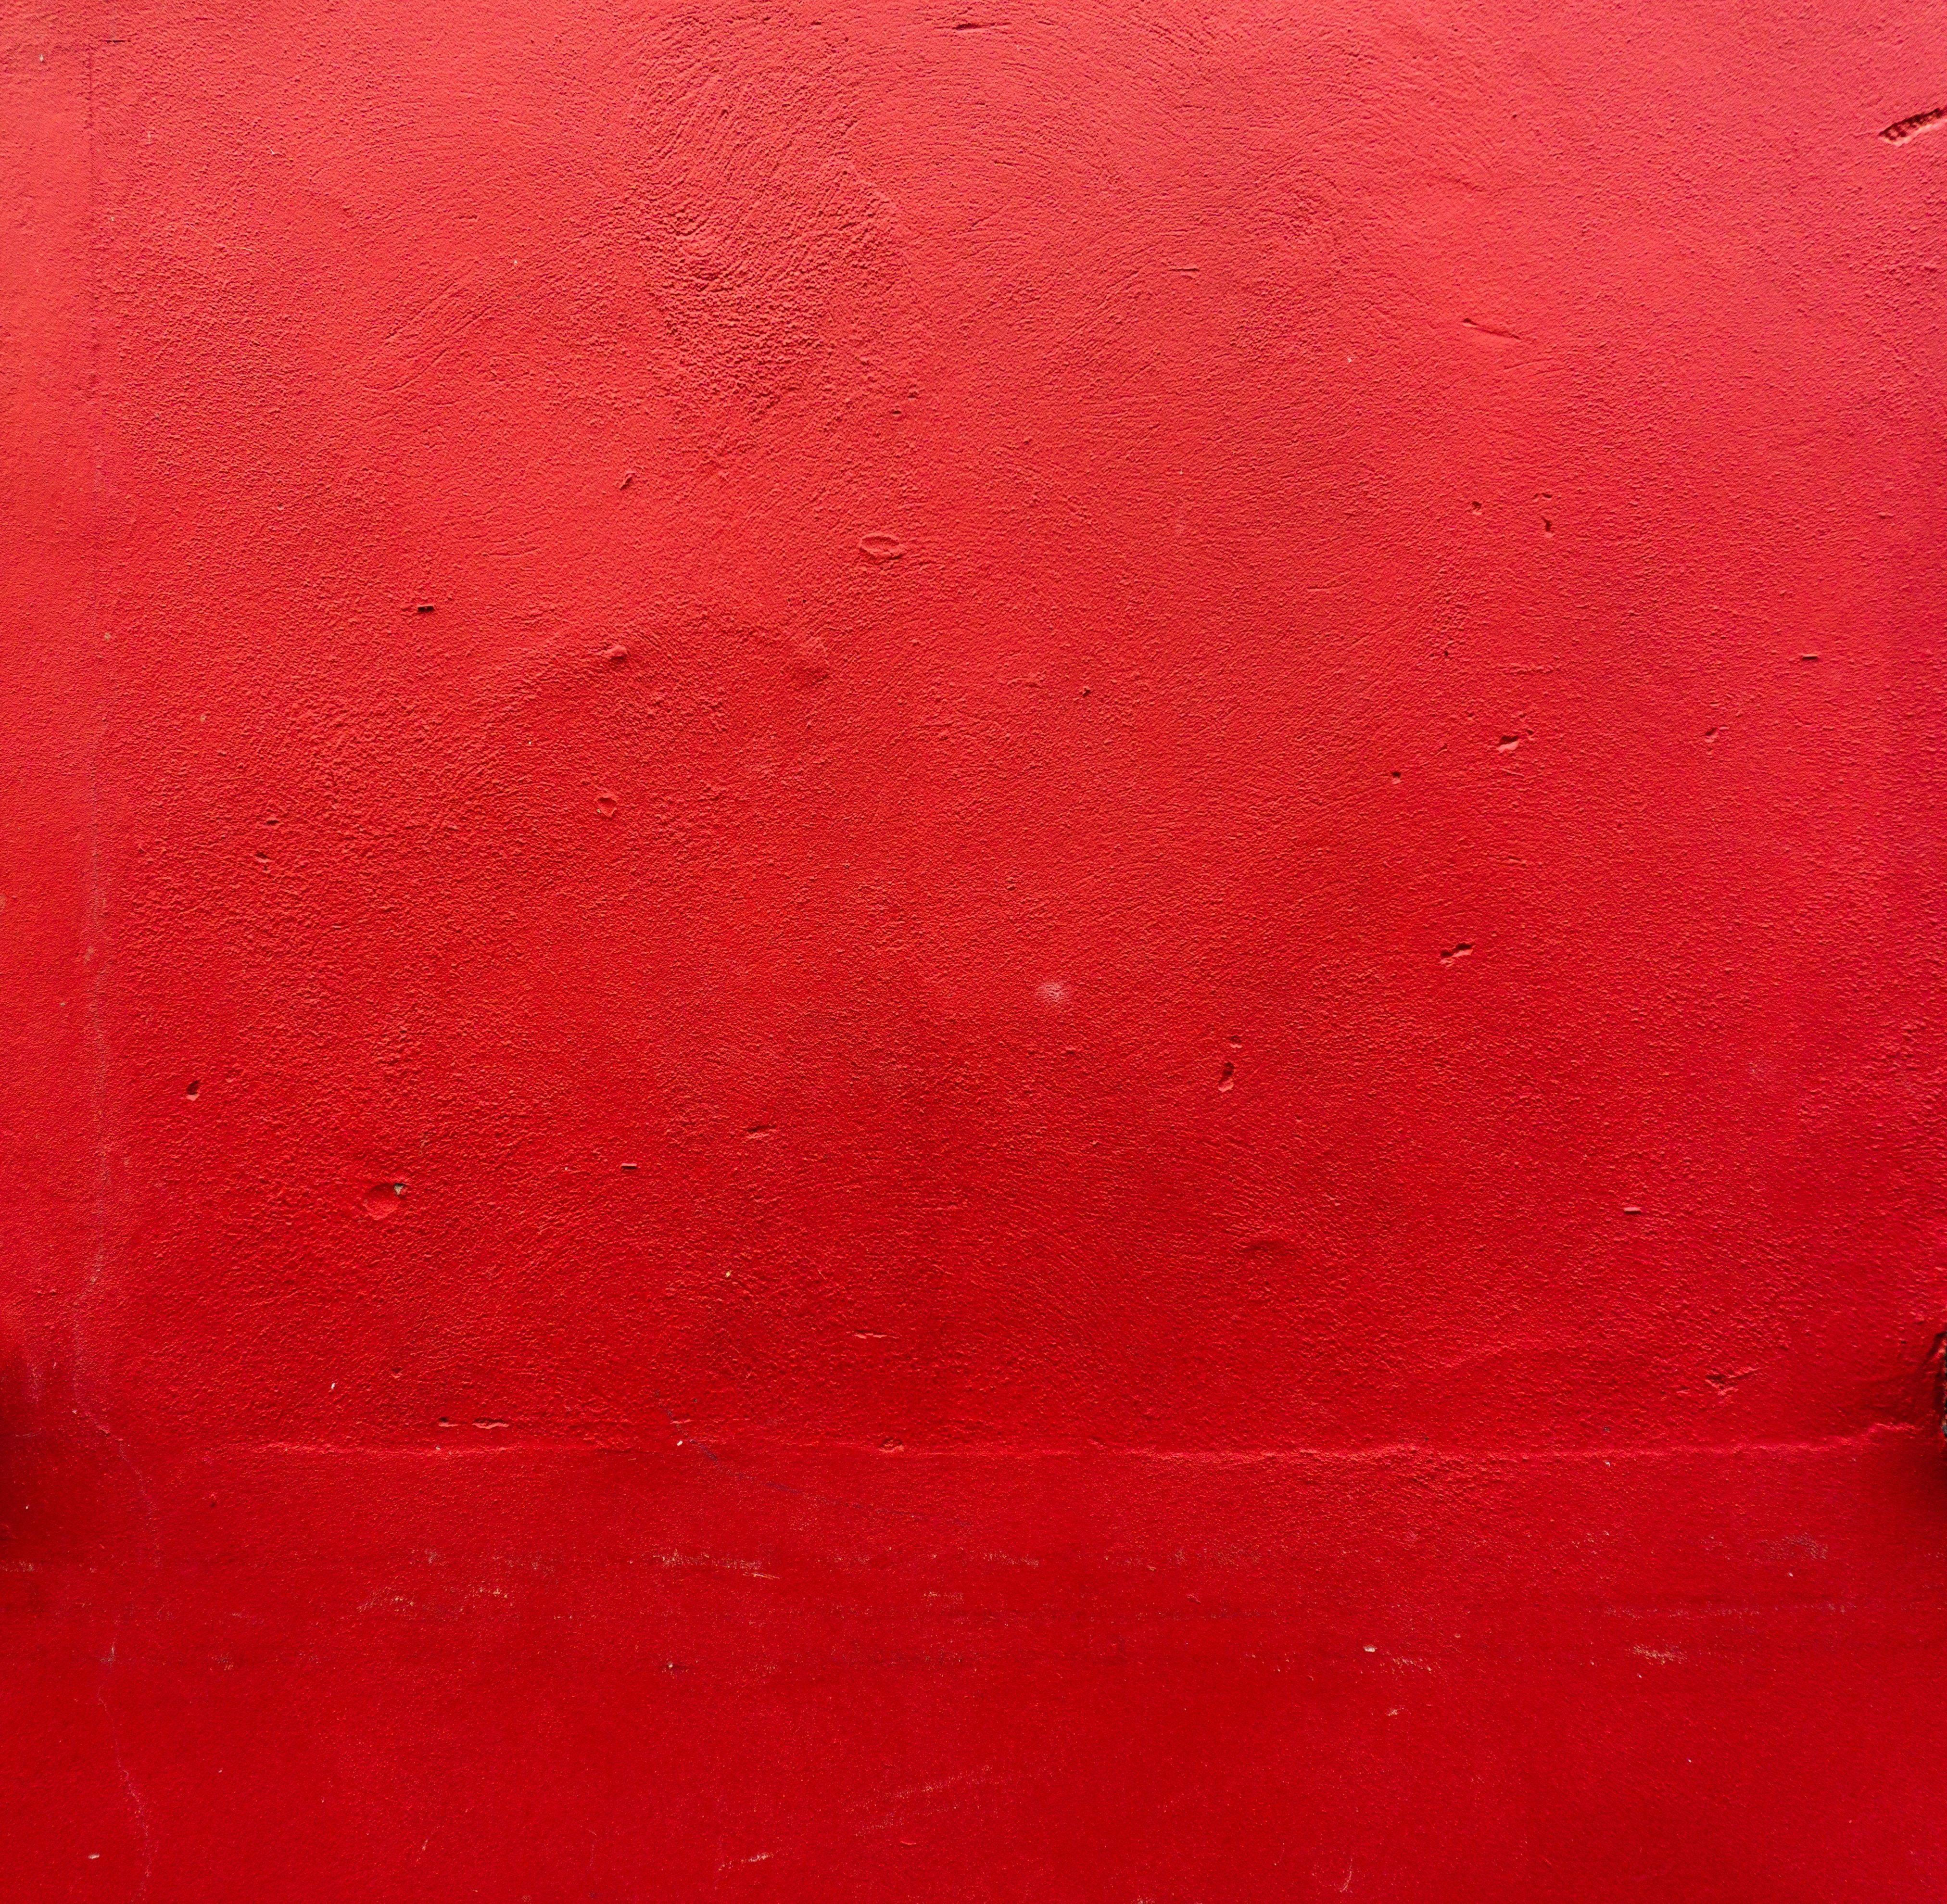 Baddies Wallpapers - Wallpaper Cave